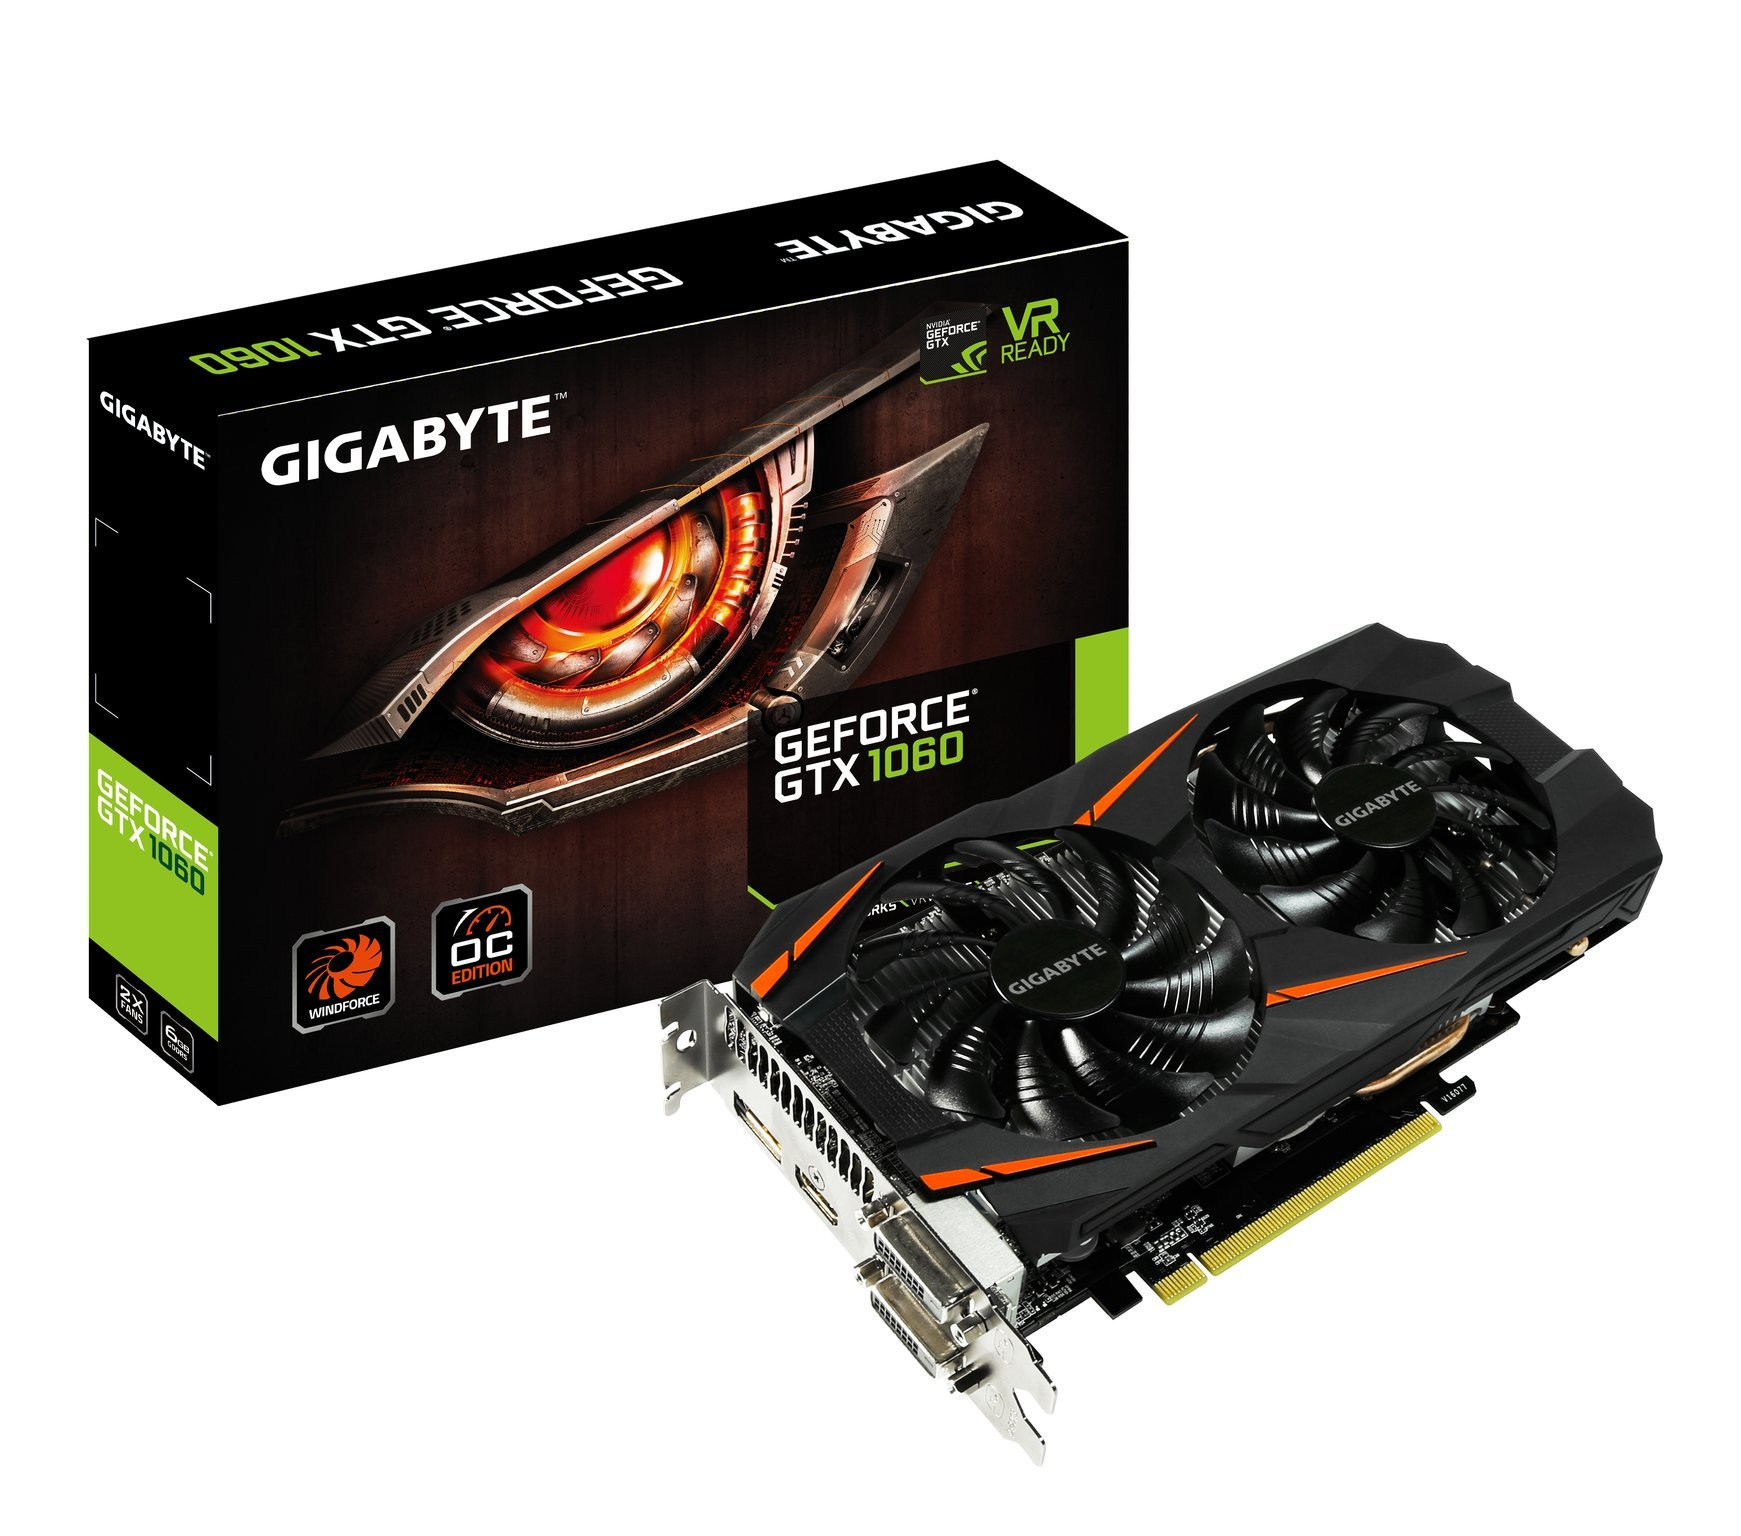 Gigabyte GeForce GTX 1060 WINDFORCE OC 6G (GV-N1060WF2OC-6GD) by Gigabyte